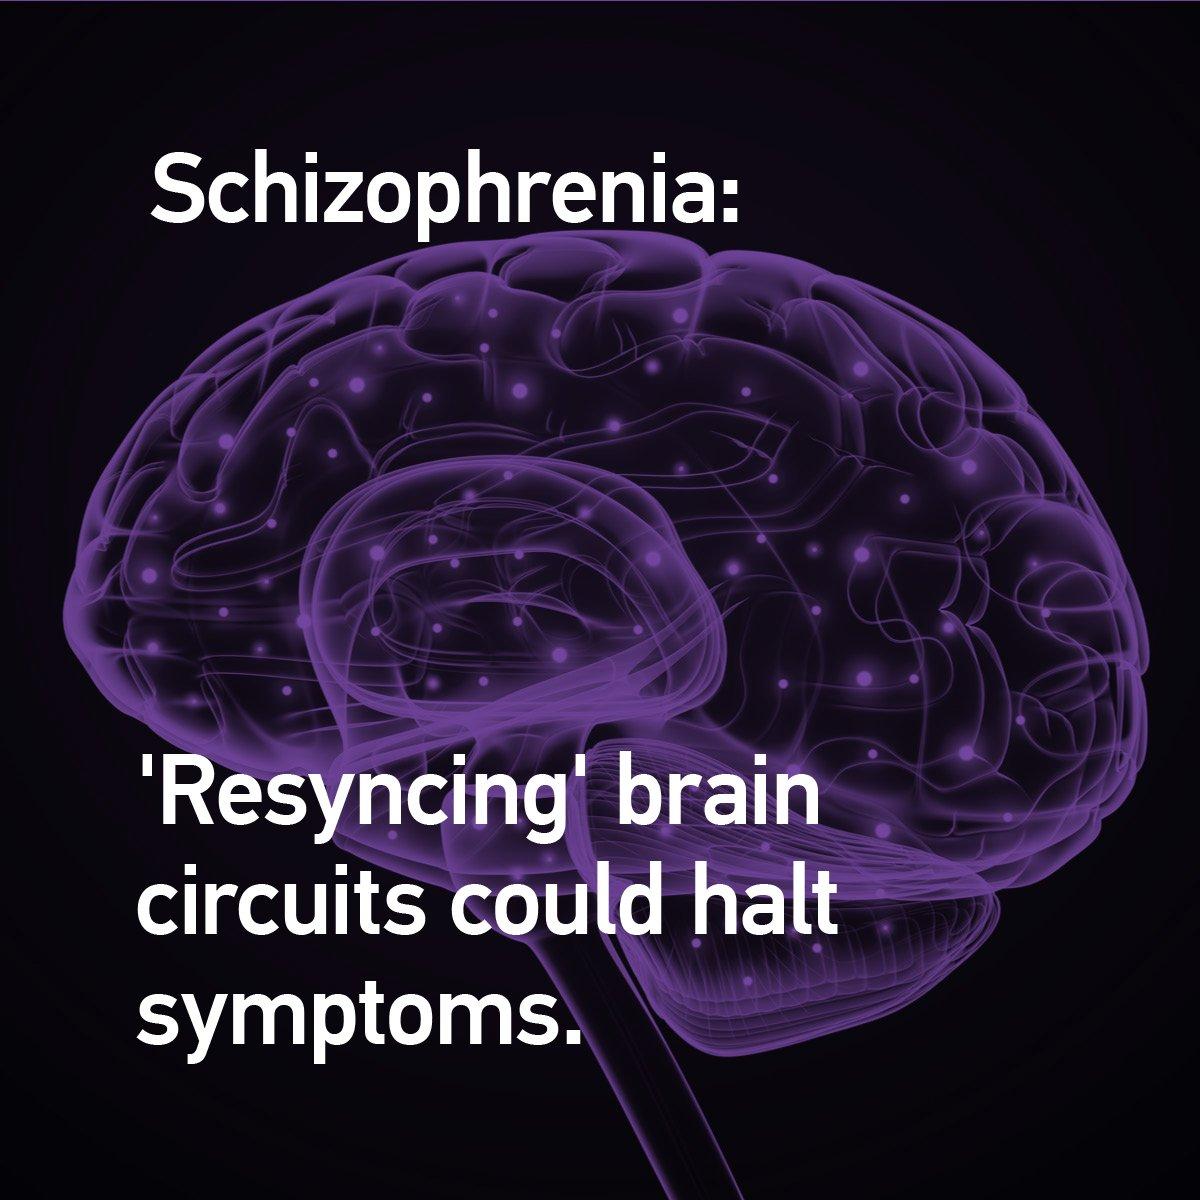 Halting Schizophrenia Before It Starts >> Specialtyrx On Twitter Trending Schizophrenia Resyncing Brain